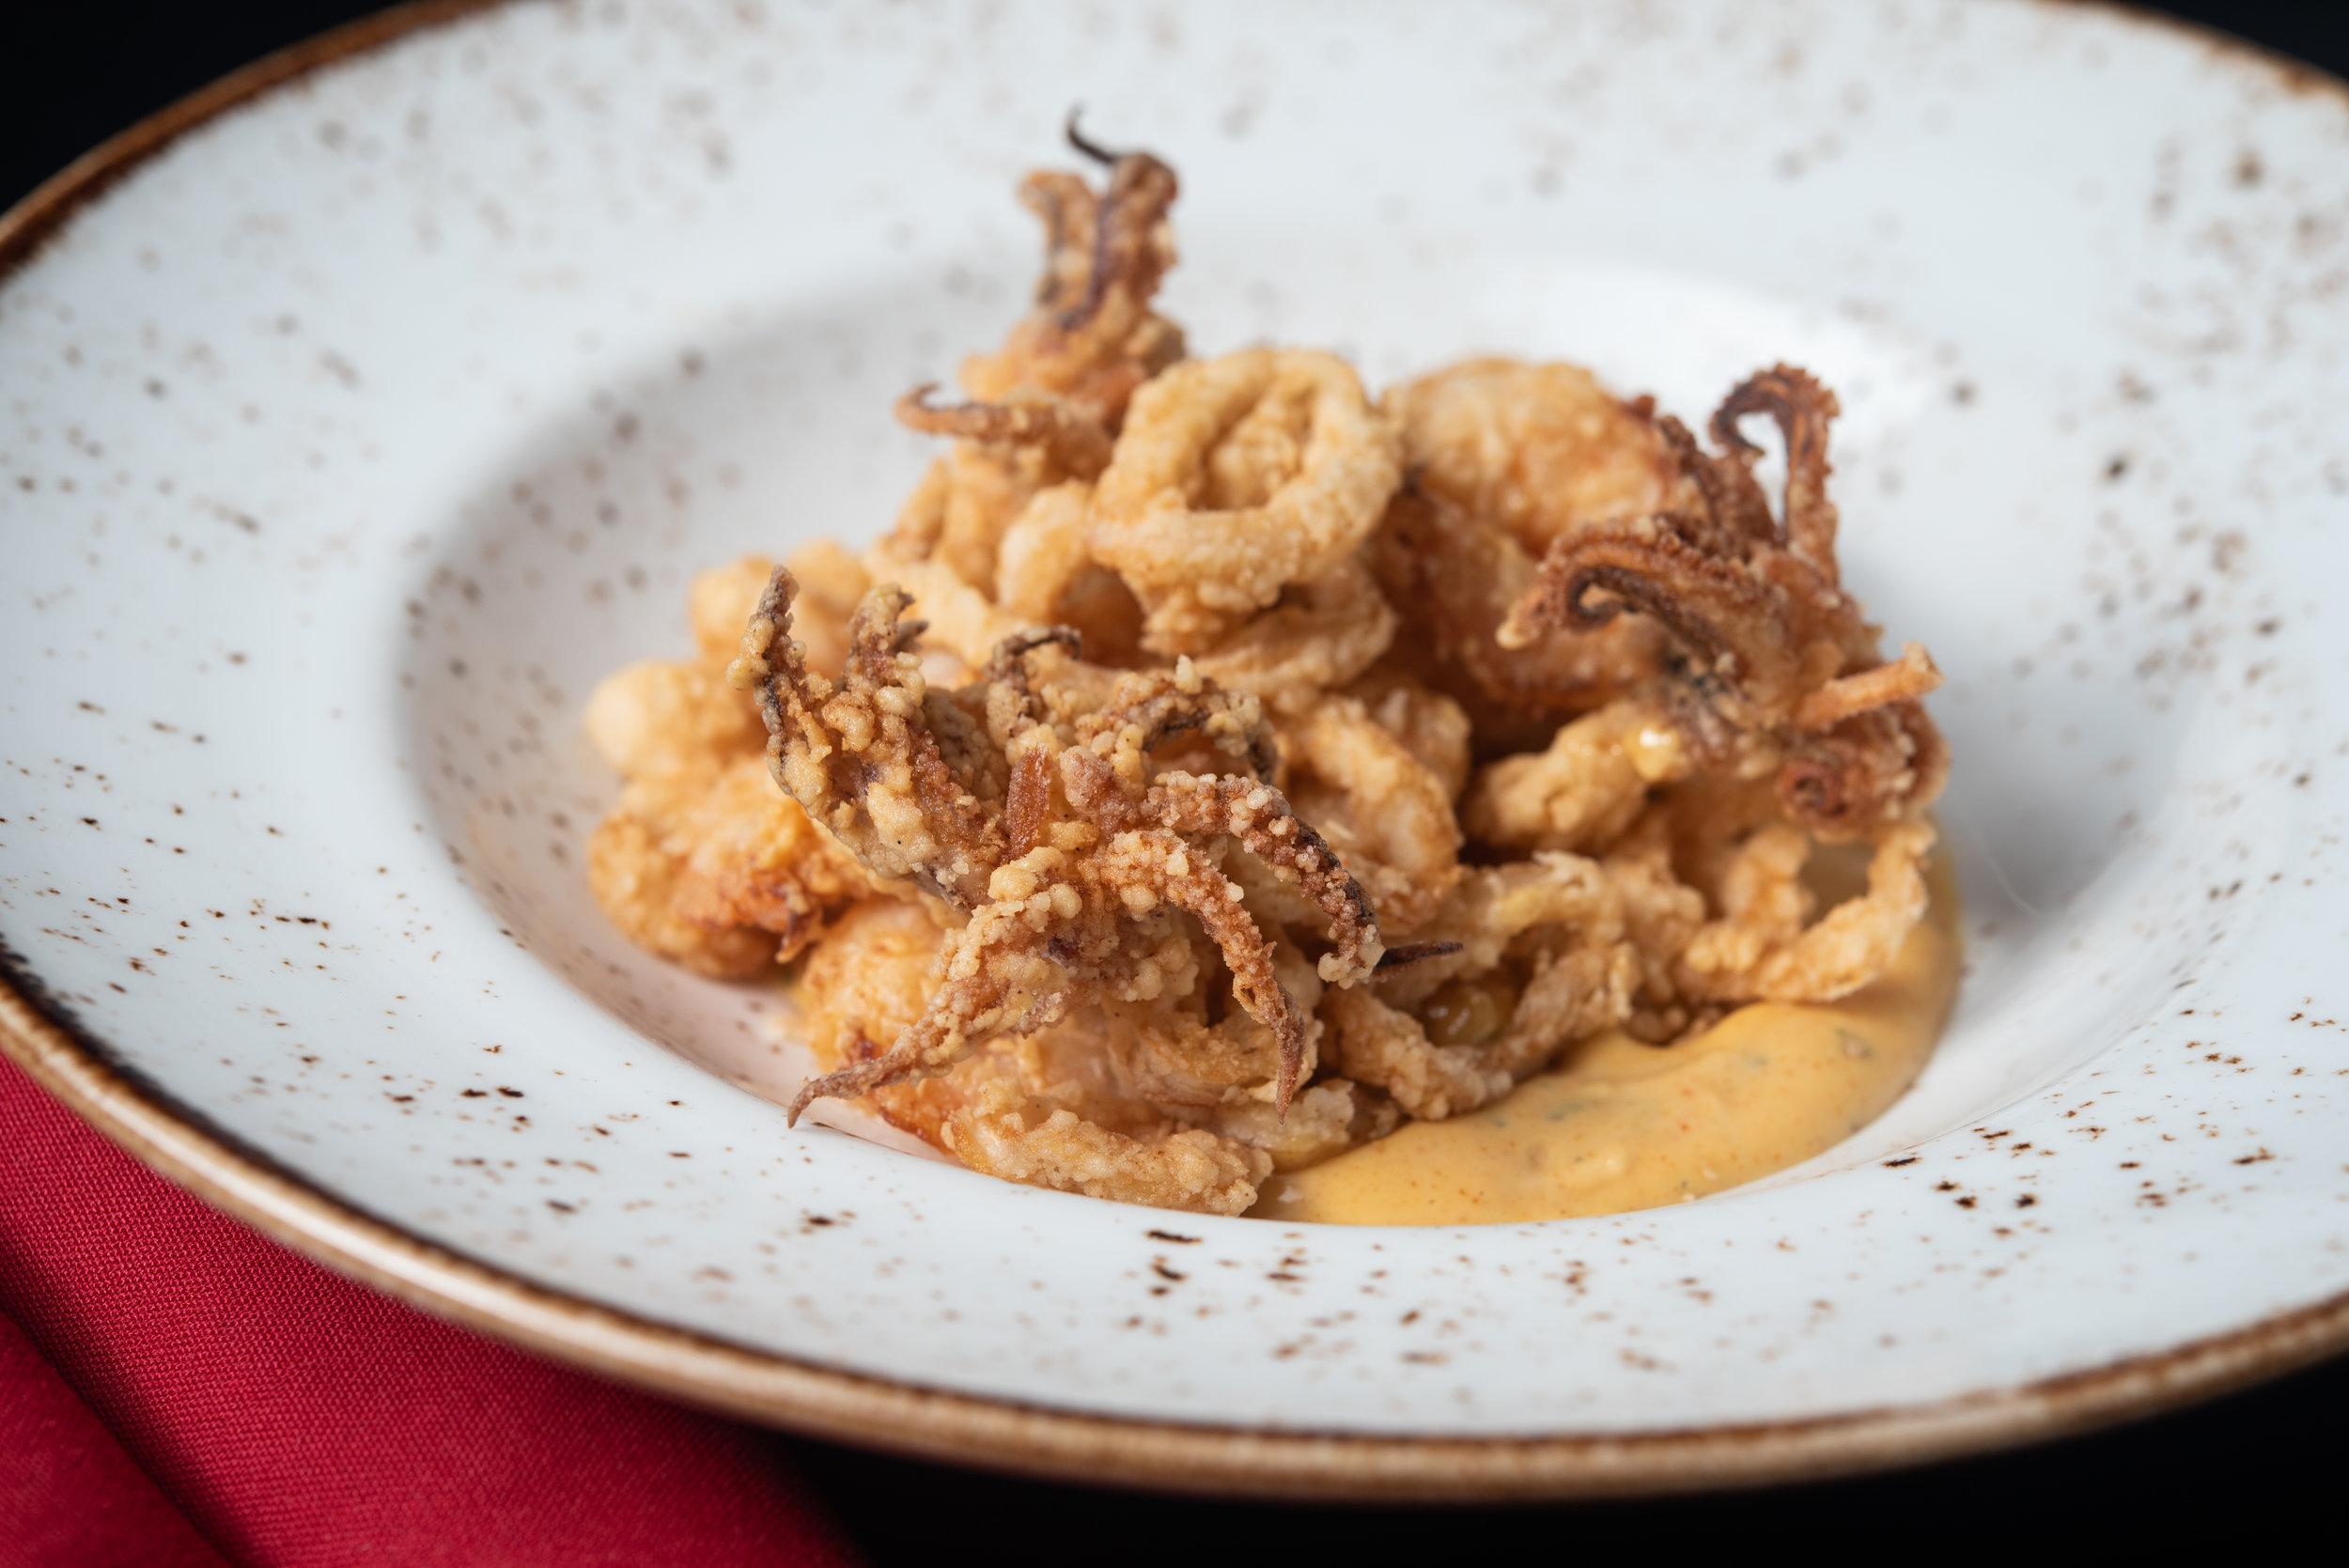 Calabash Shrimp & Calamari 2.jpg